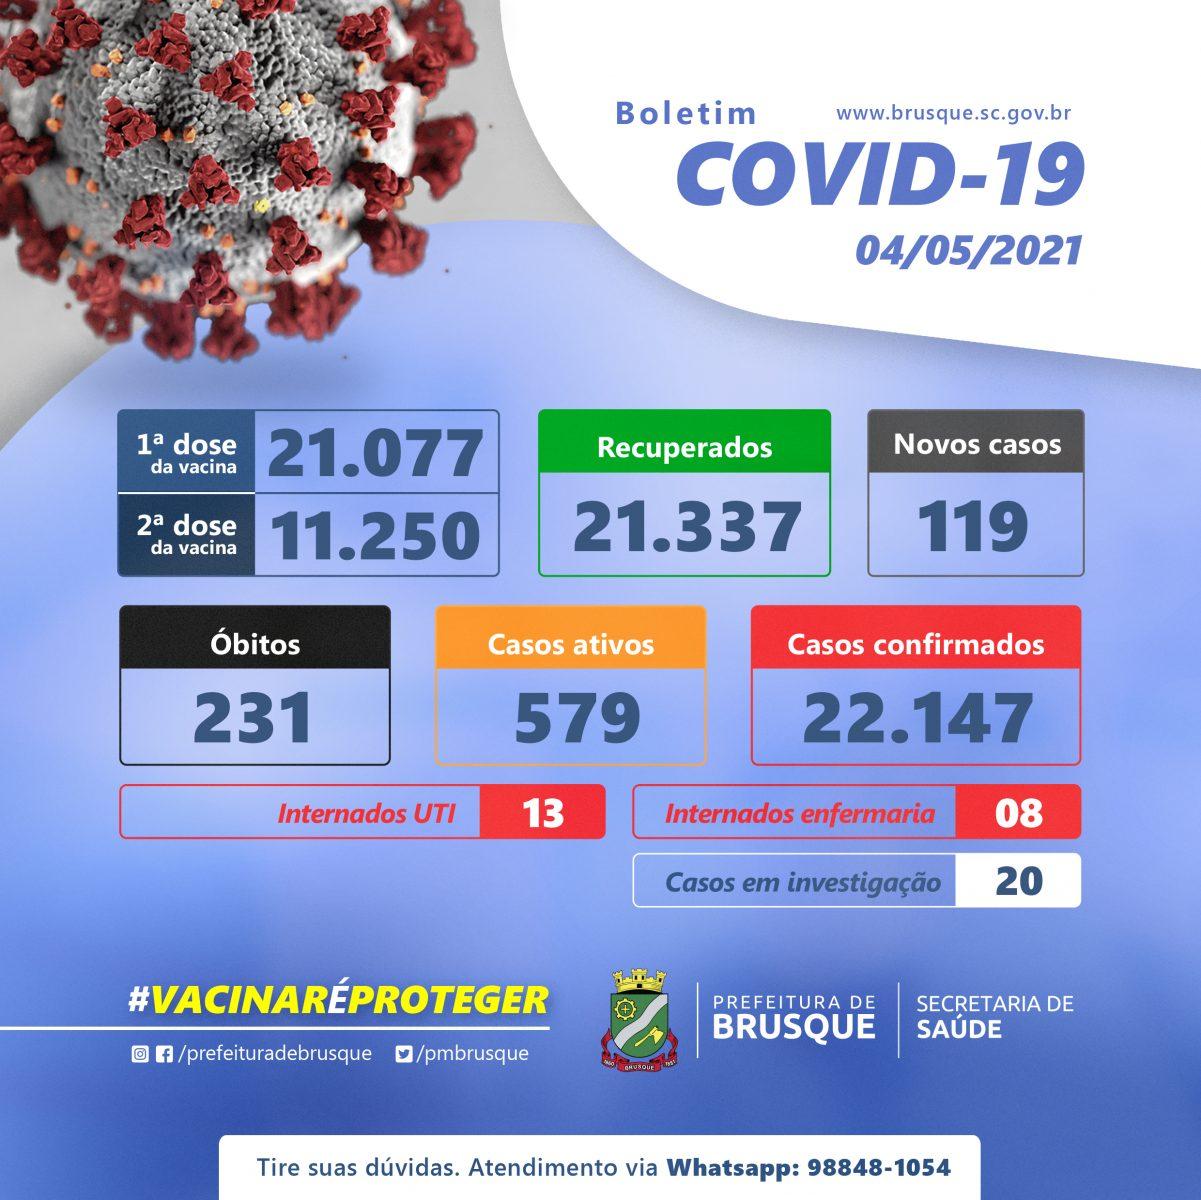 Covid 19: Confira o boletim epidemiológico desta terça-feira (04)